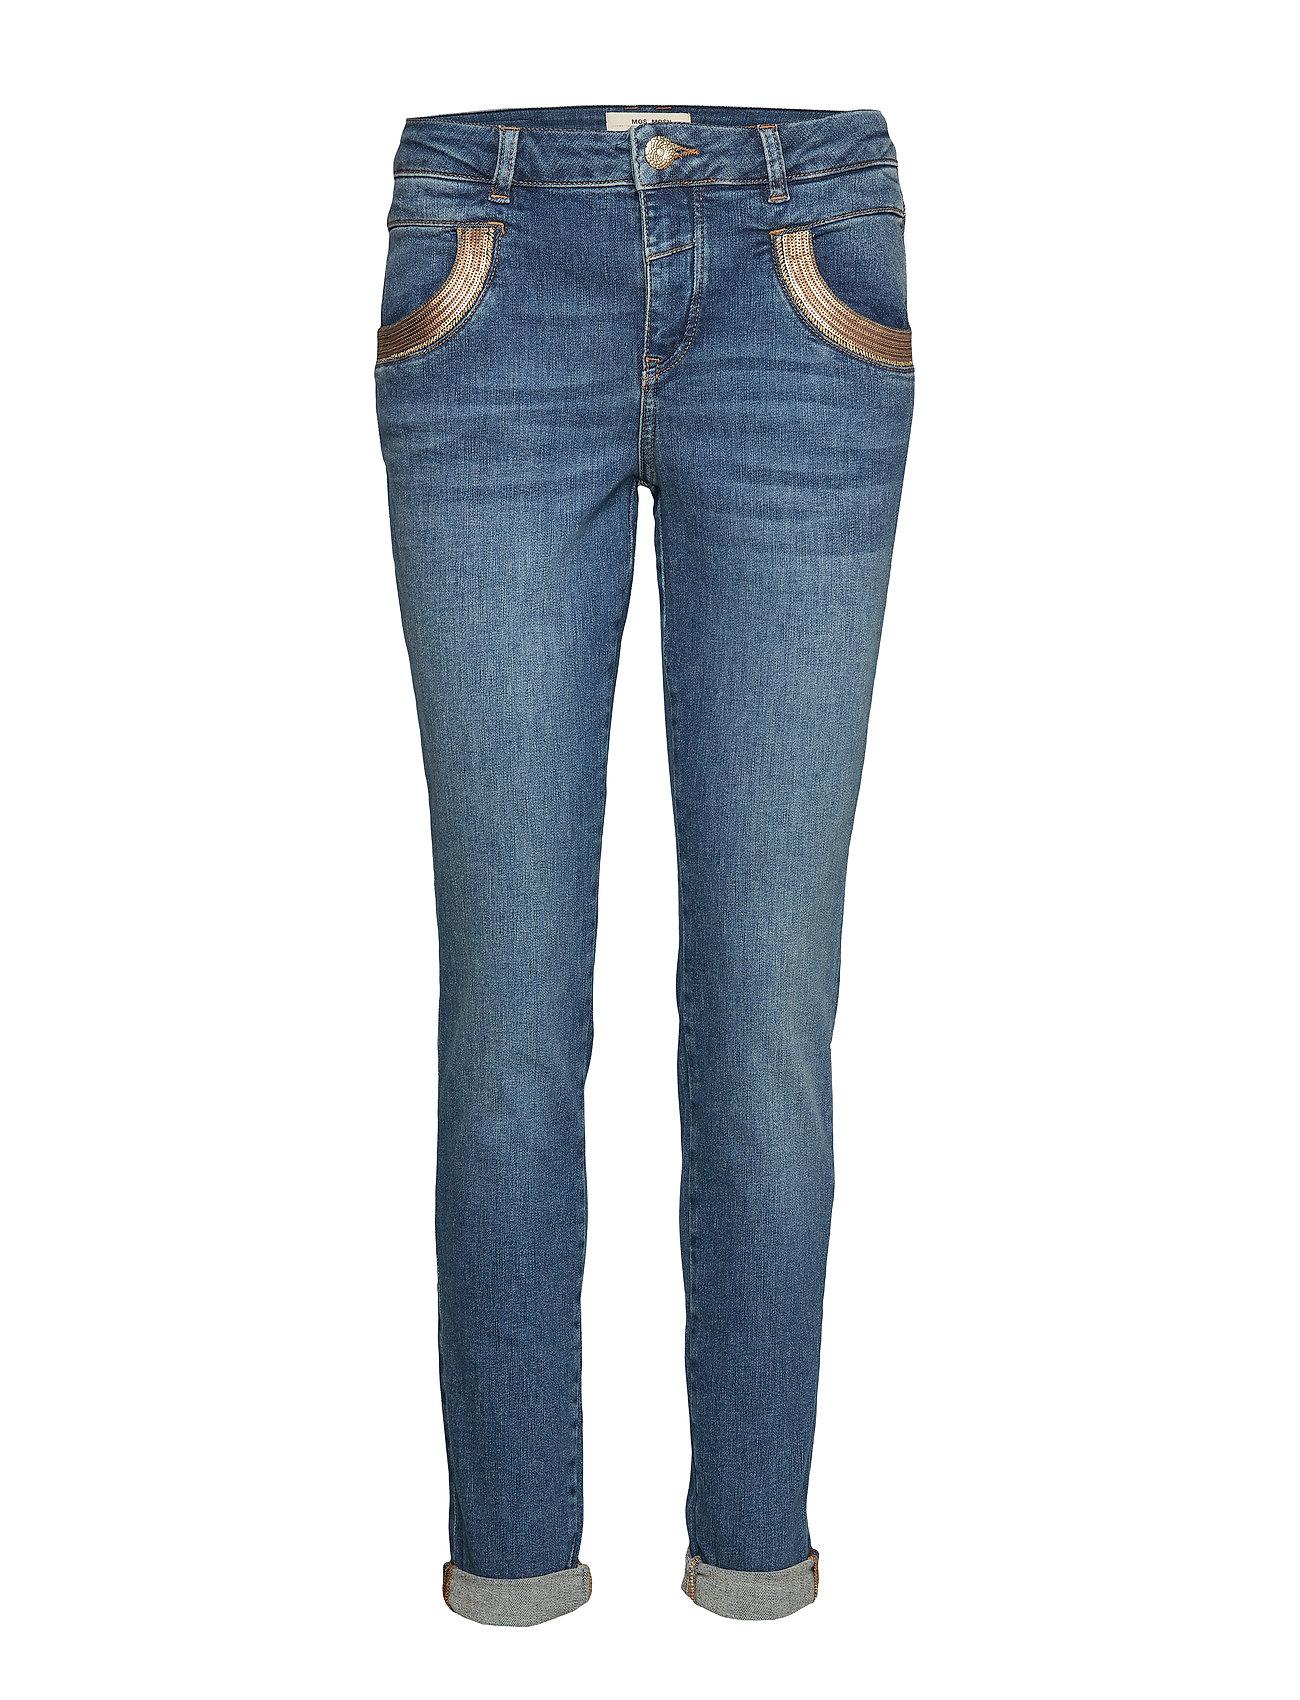 MOS MOSH Naomi Cube Jeans - BLUE DENIM